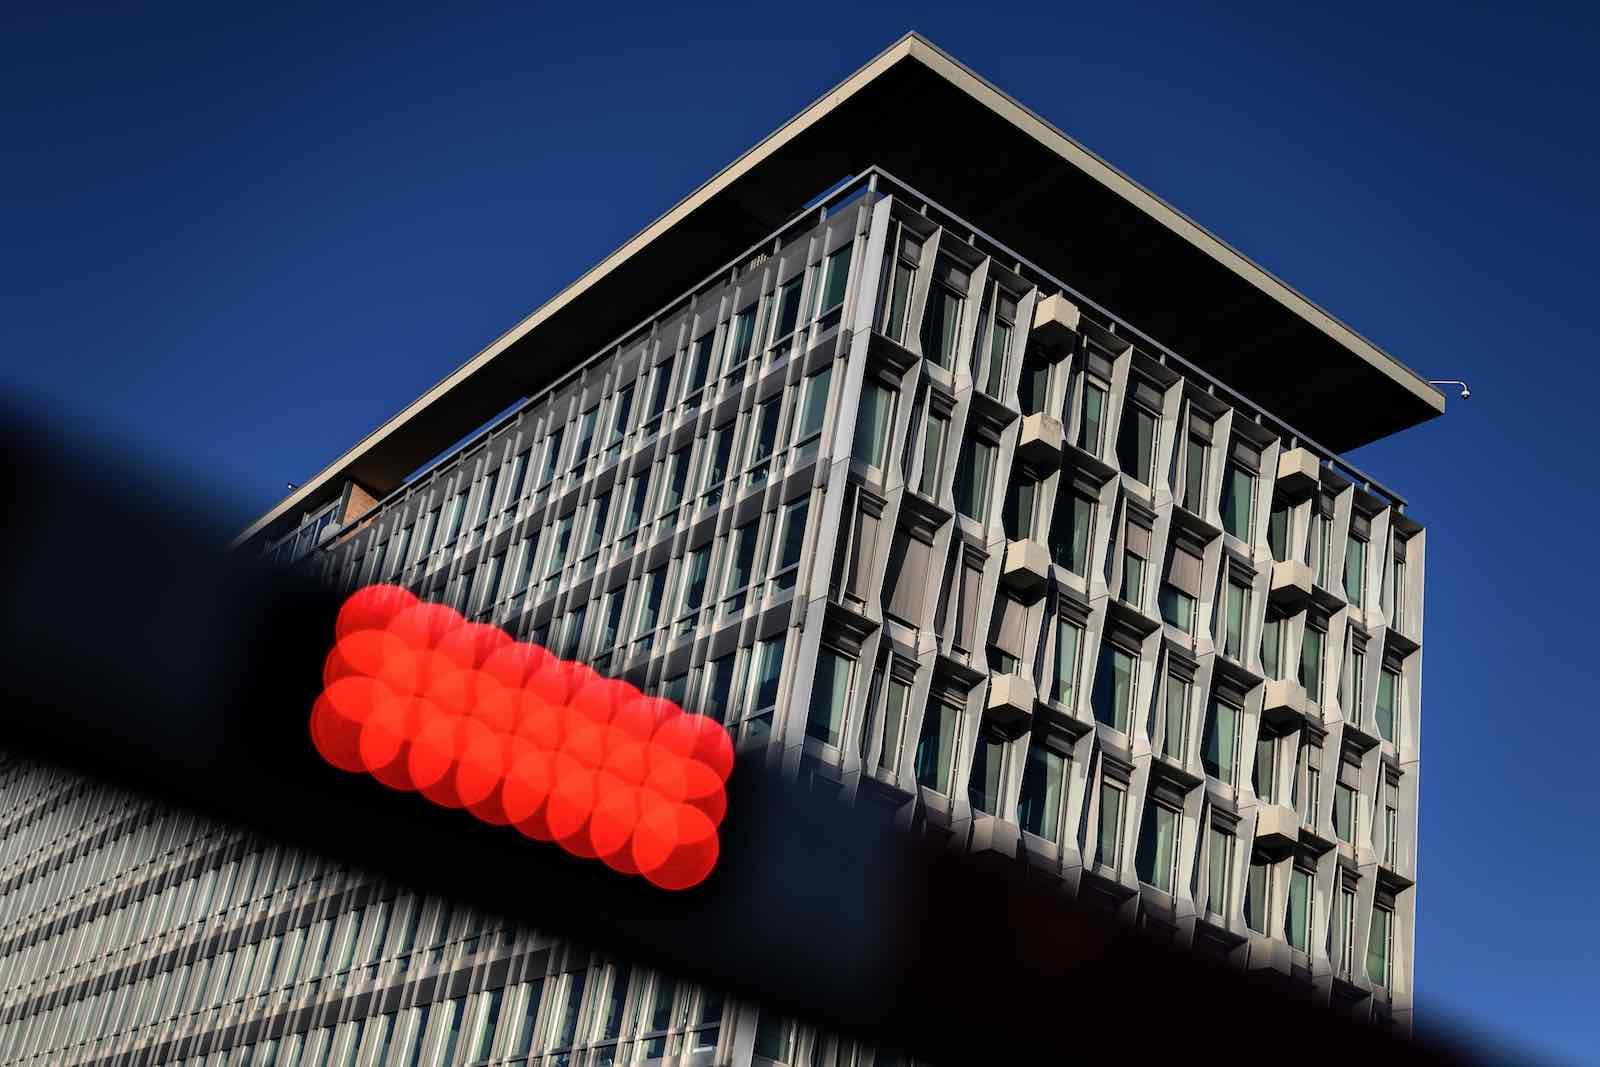 building photography fabrice coffrini afp via getty